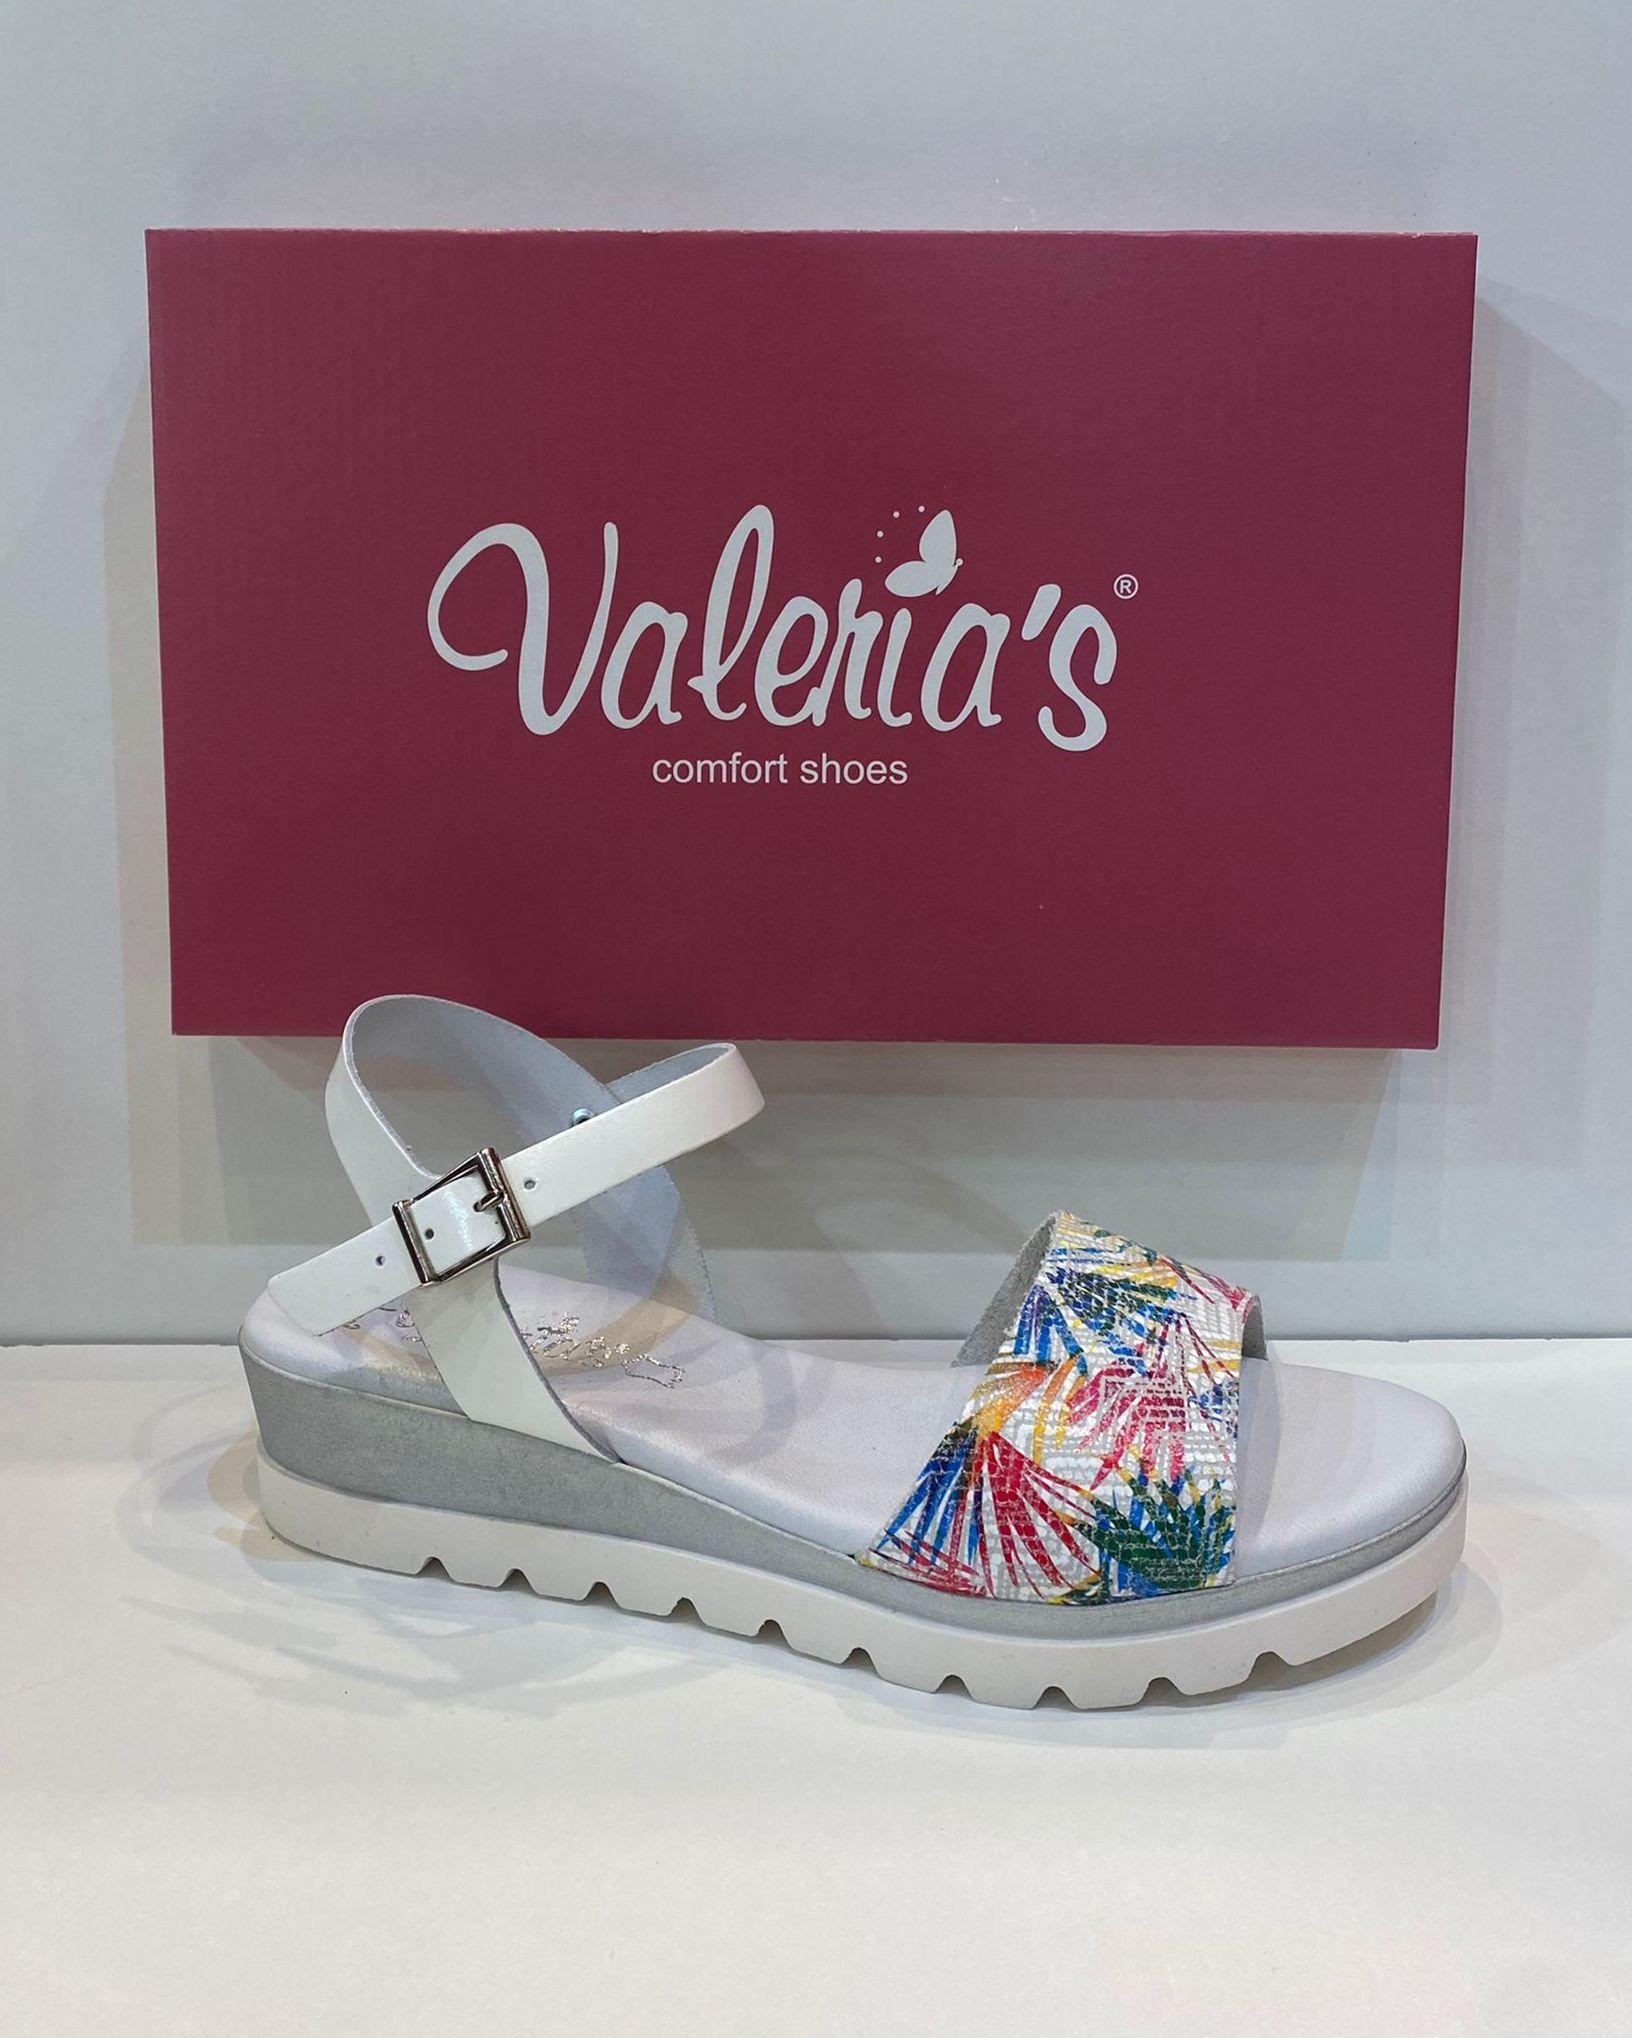 Sandàlia de dona, de la marca Valeria's, ample especial, plantilla de viscoelàstica, sola de goma antilliscant Flexy confort 44.90€ www.calzadosllinas.es